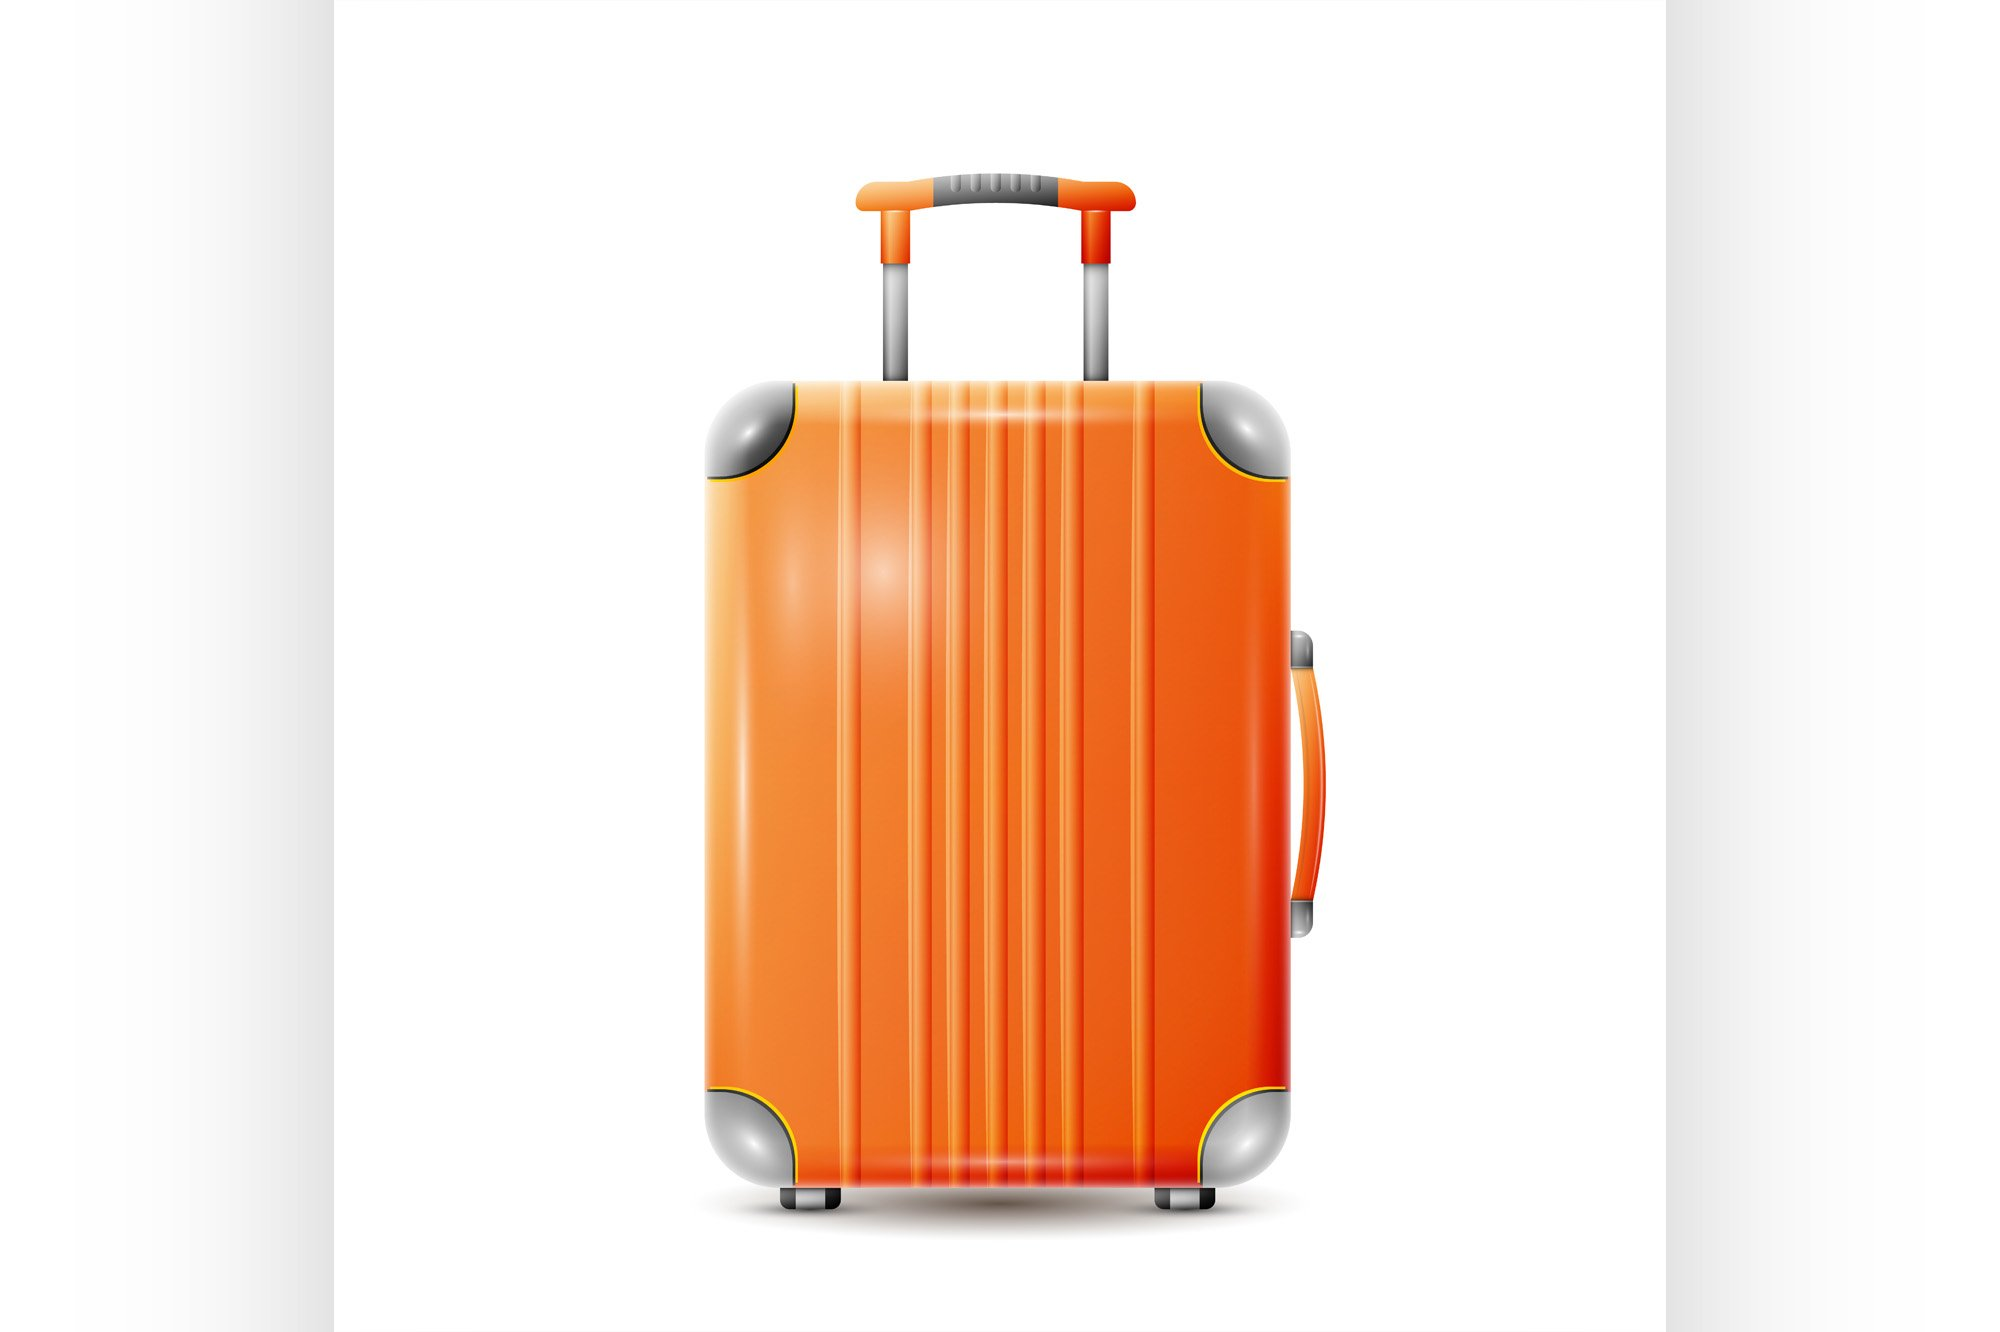 Large polycarbonate suitcase example image 1